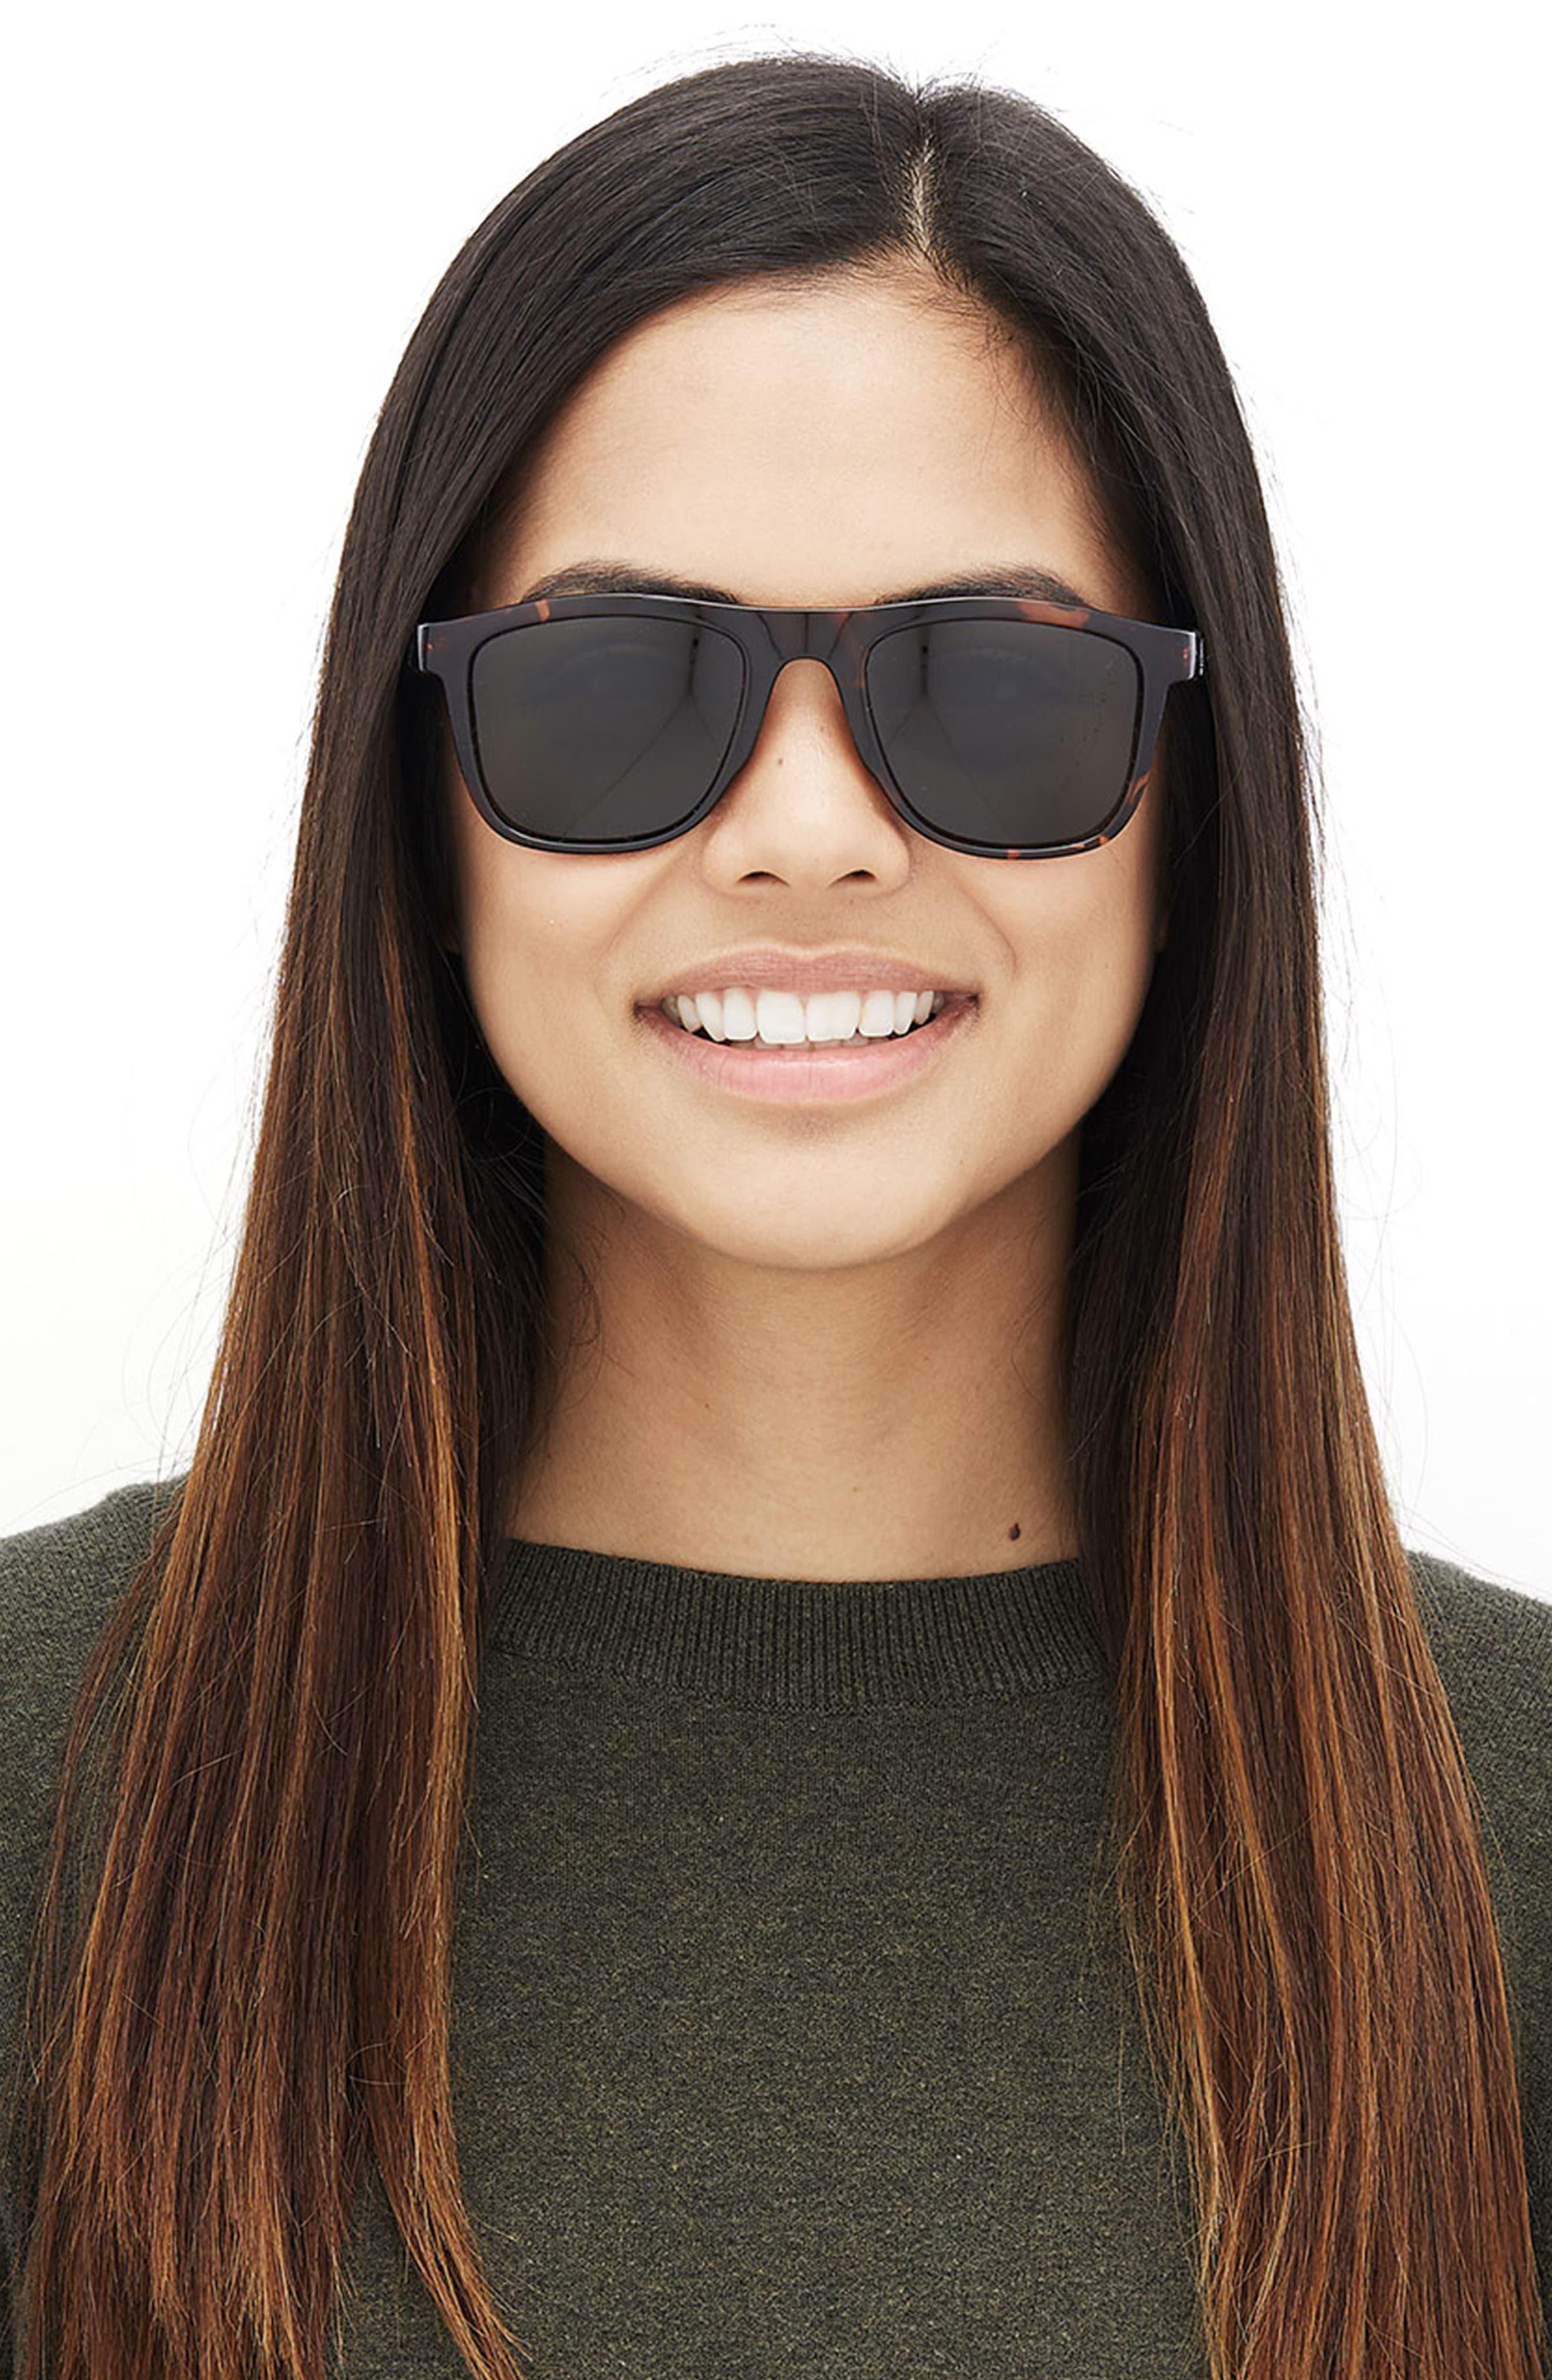 Navarros 53mm Polarized Sunglasses,                             Alternate thumbnail 2, color,                             TORTOISE FOREST